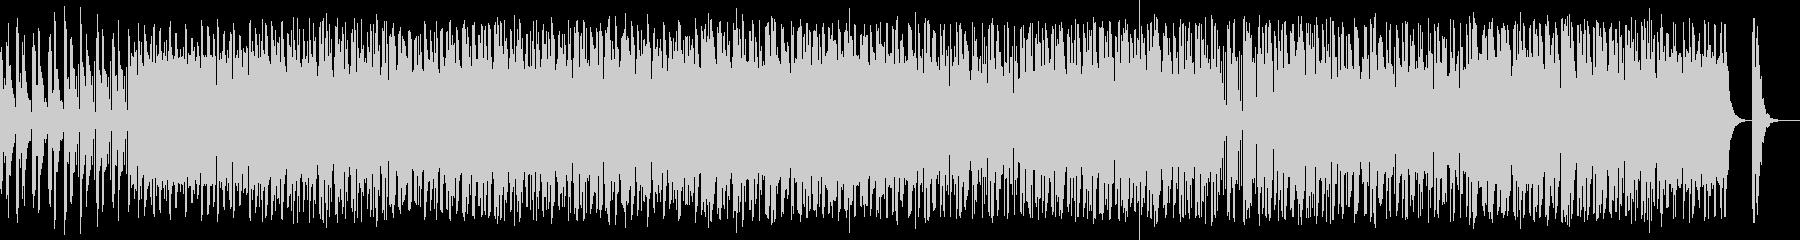 anvihimon2_seventの未再生の波形